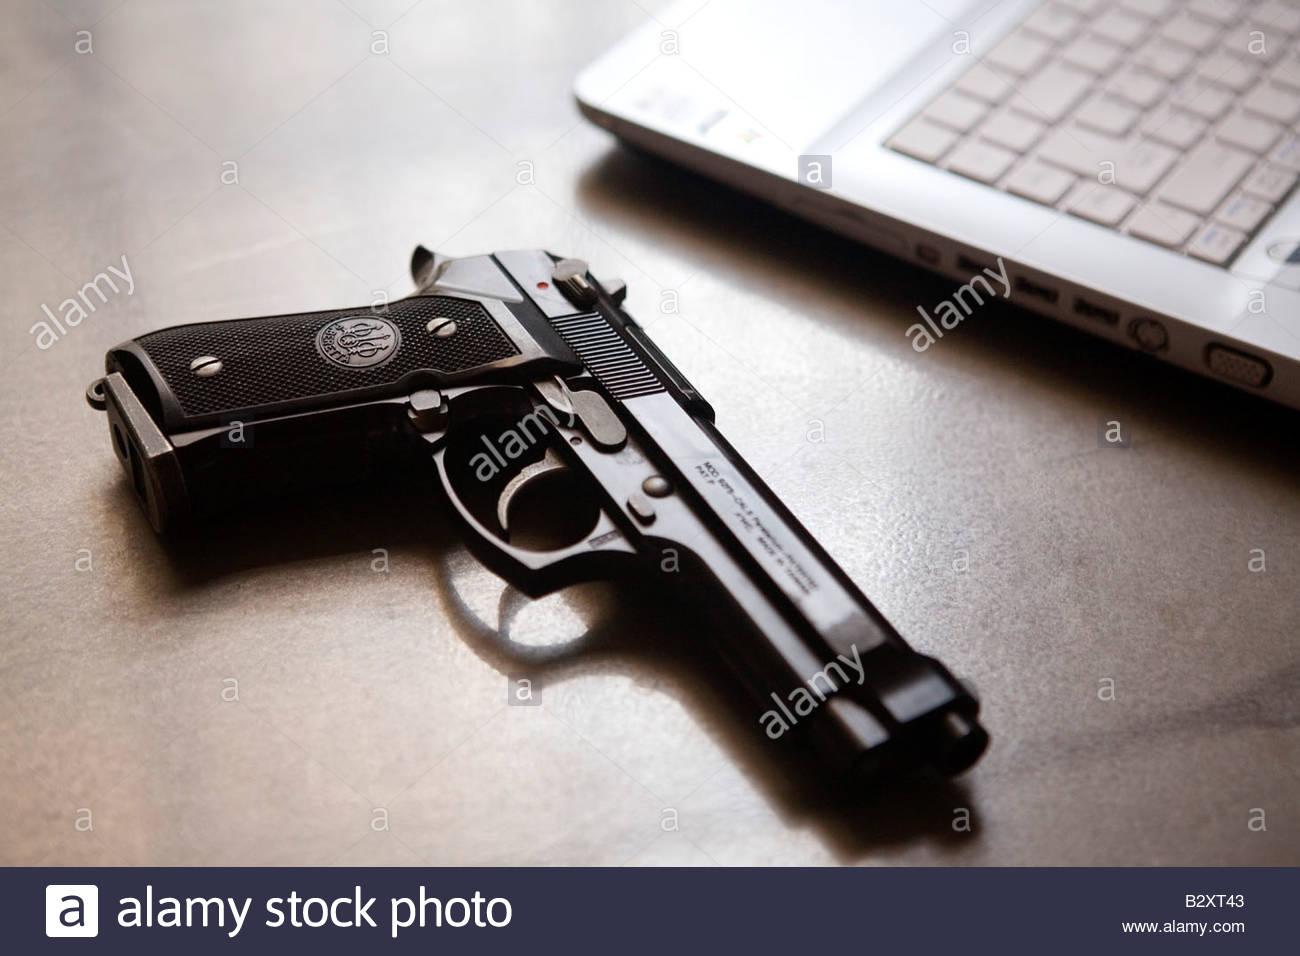 gun and laptop, office - Stock Image